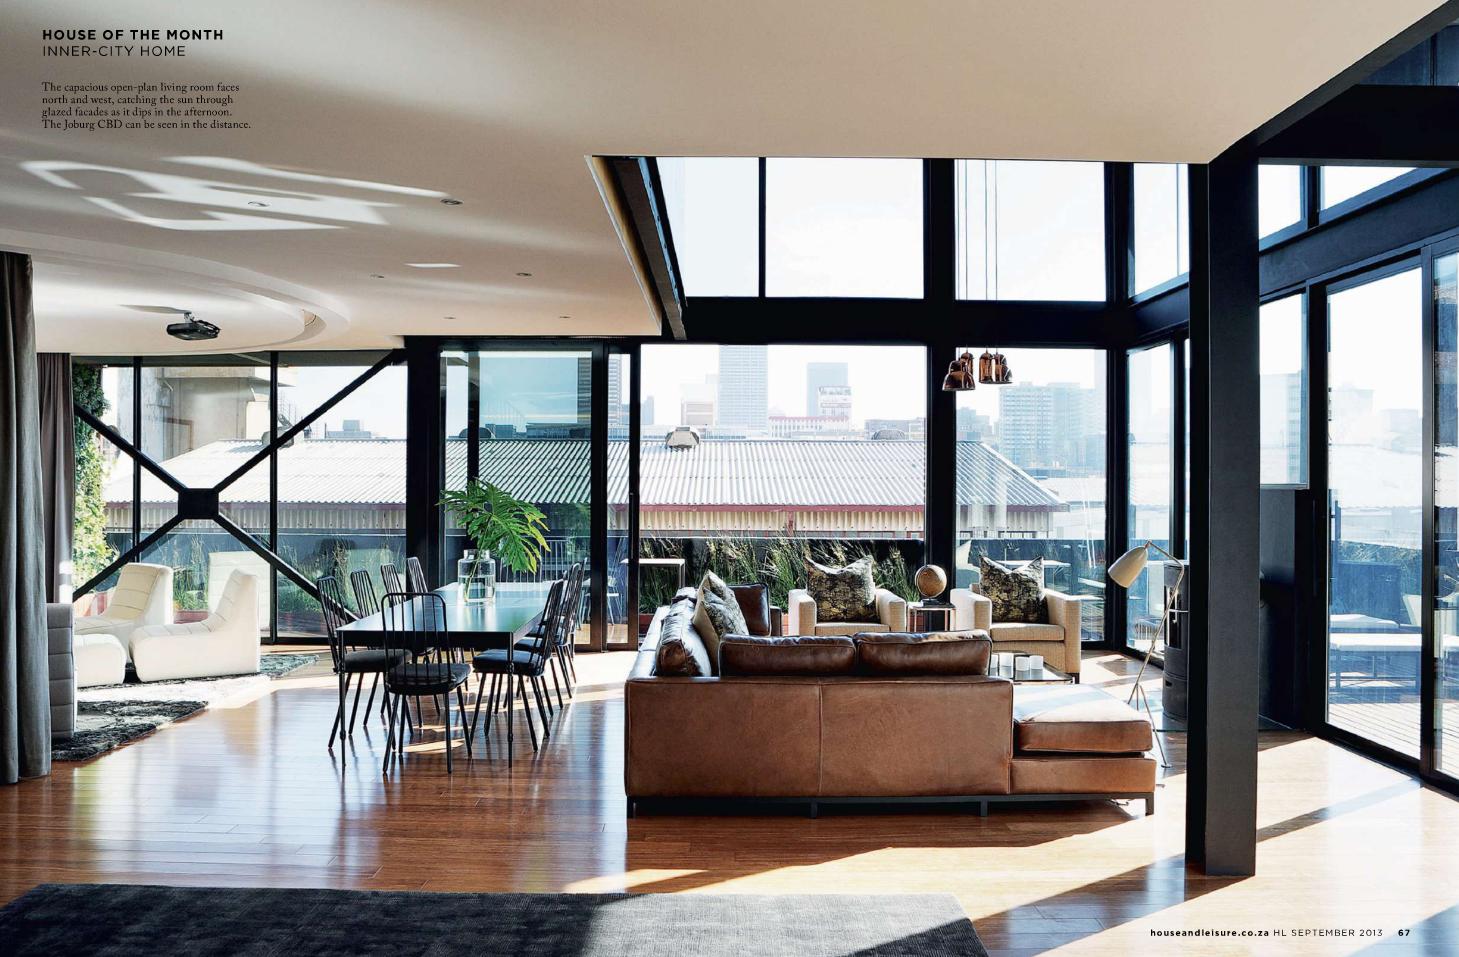 I Loved This Penthouse In The Johannesburg CBD September 2013 House Leisure Magazine